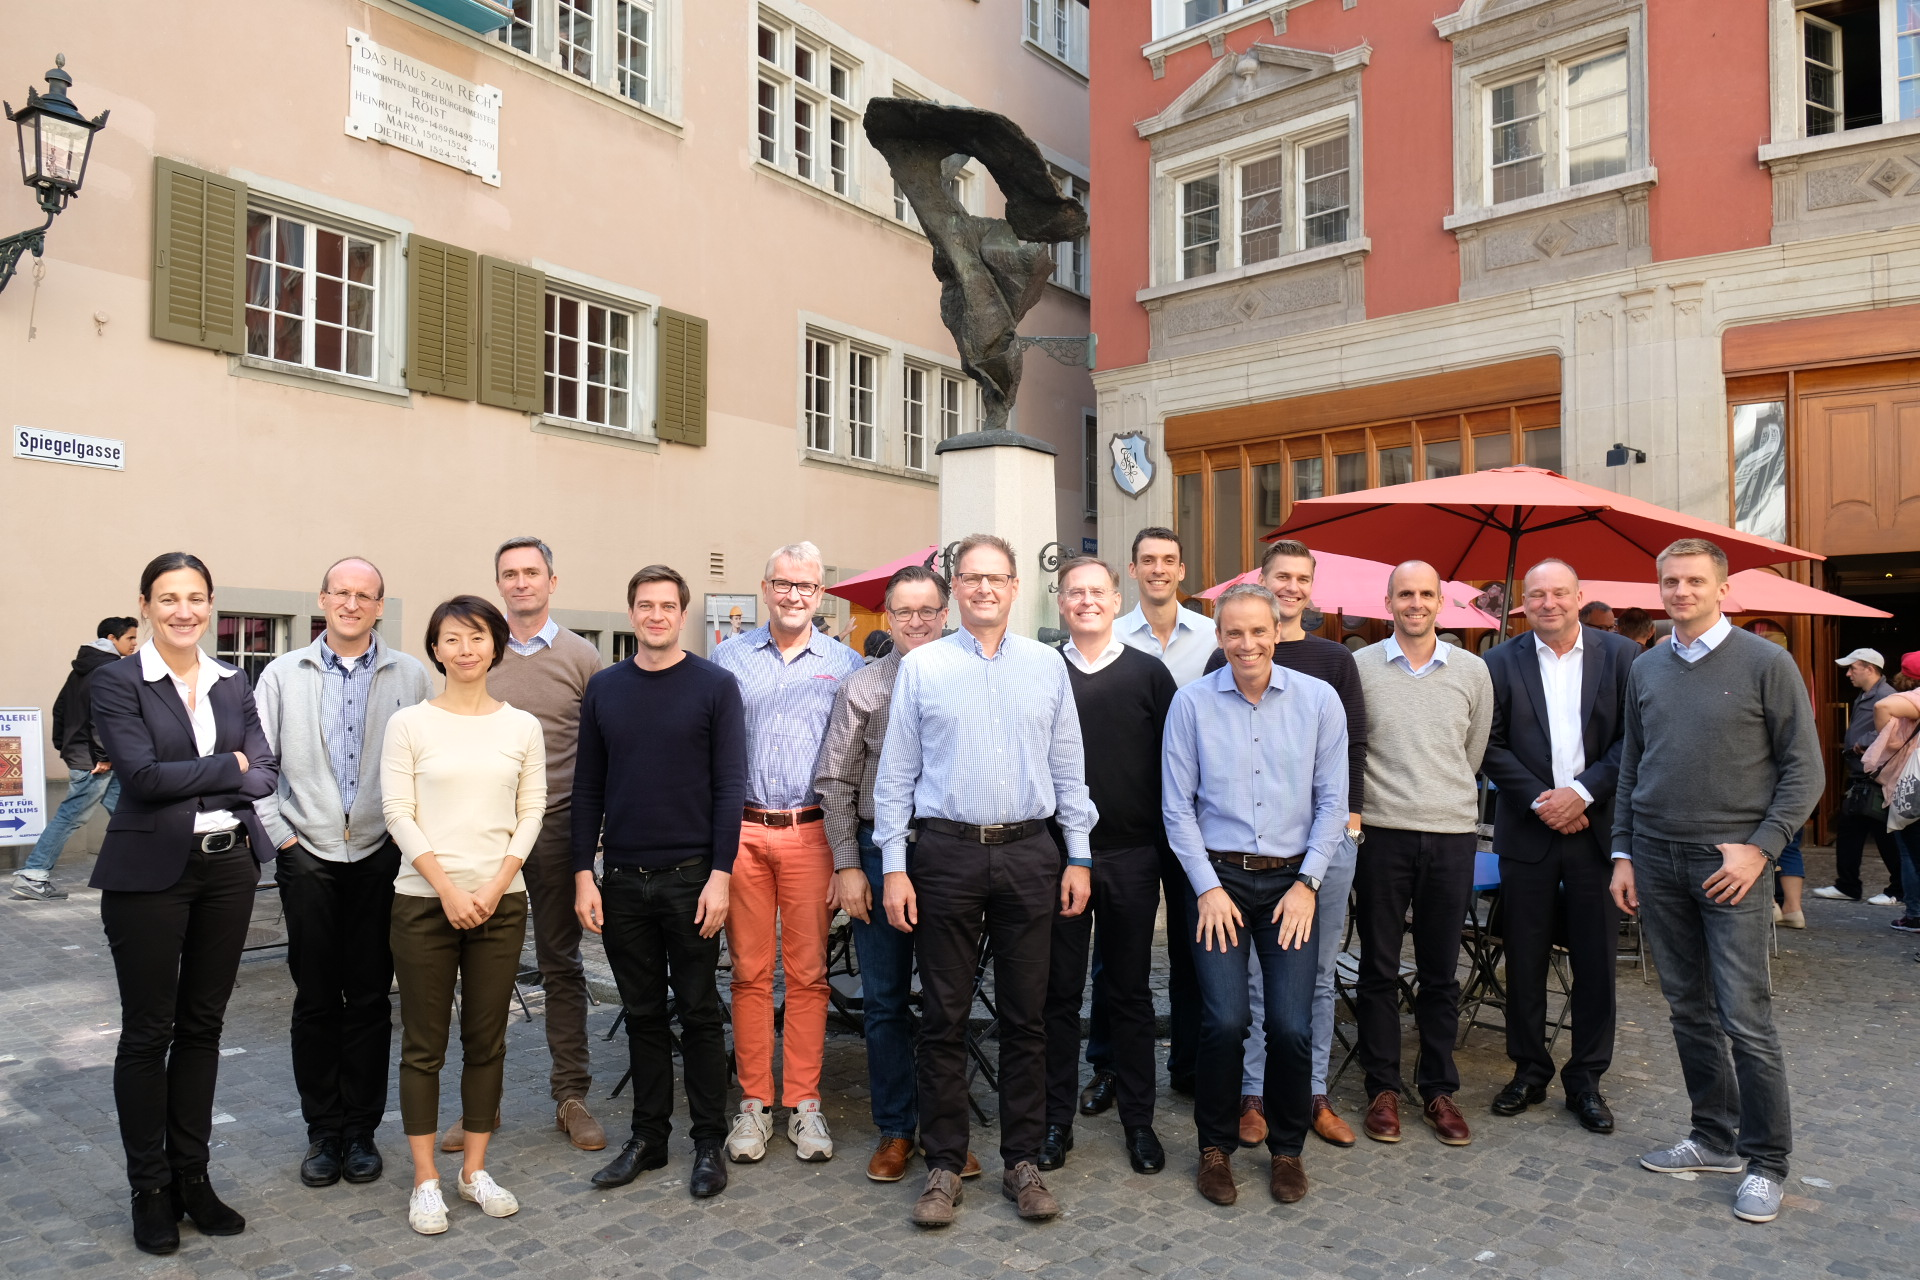 Covestro´s group in Zurich